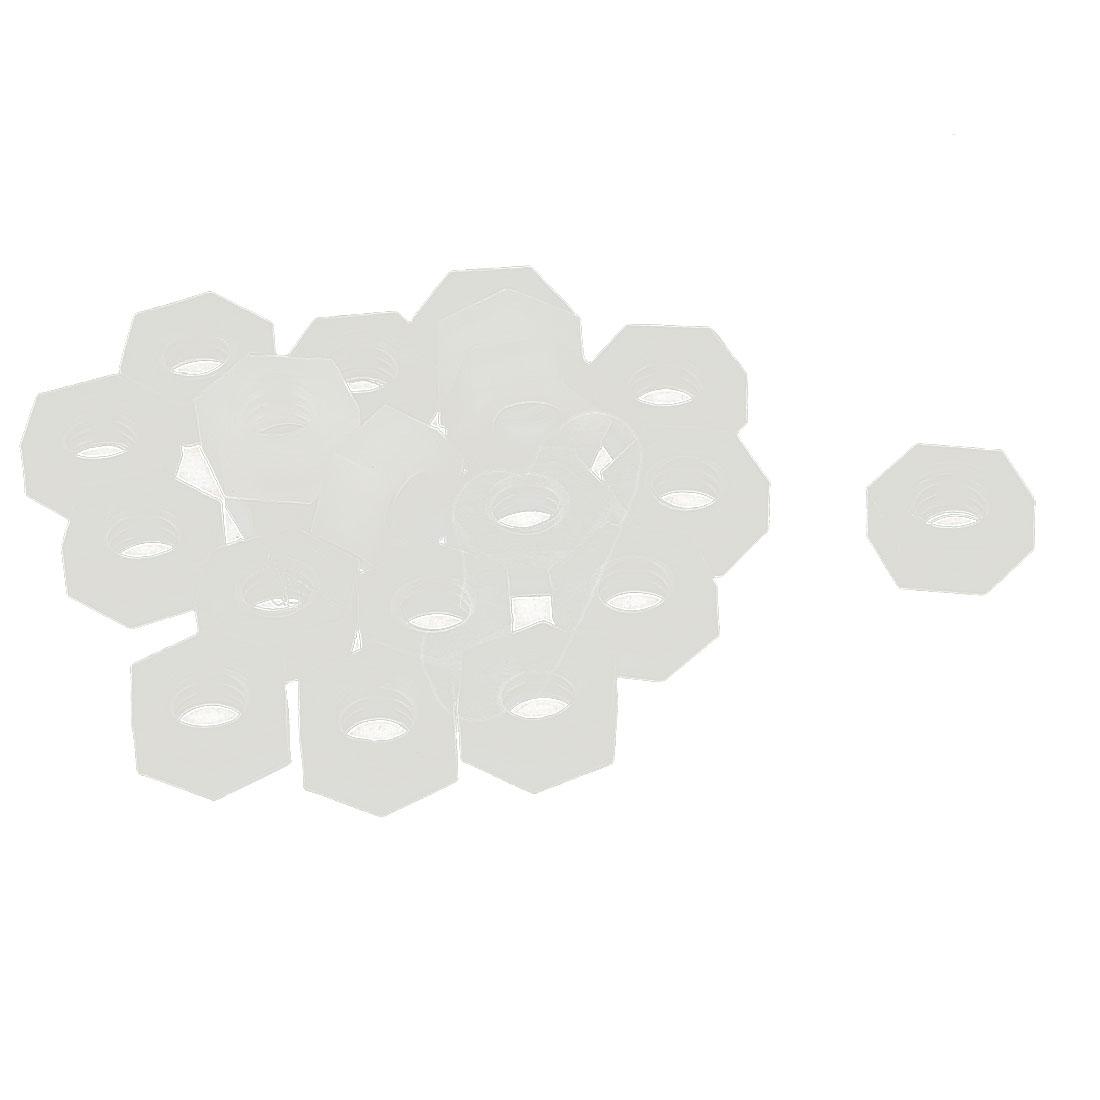 20pcs Pack Of Metric M4 Insert Lock Nylon Full Hex Nuts Plastic Off-White